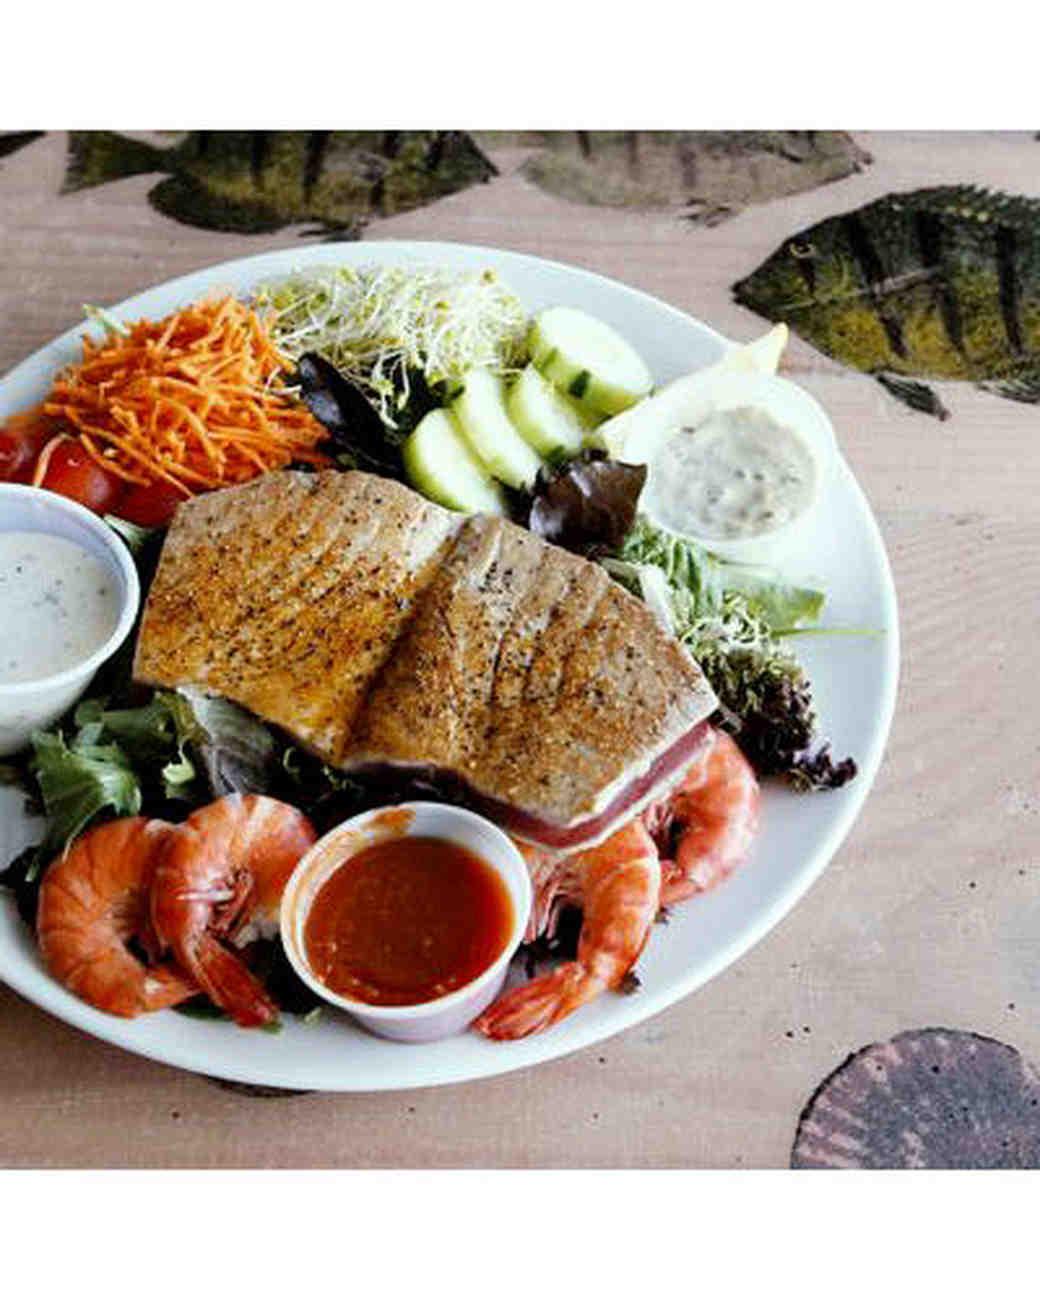 paia fishmarket in hawaii